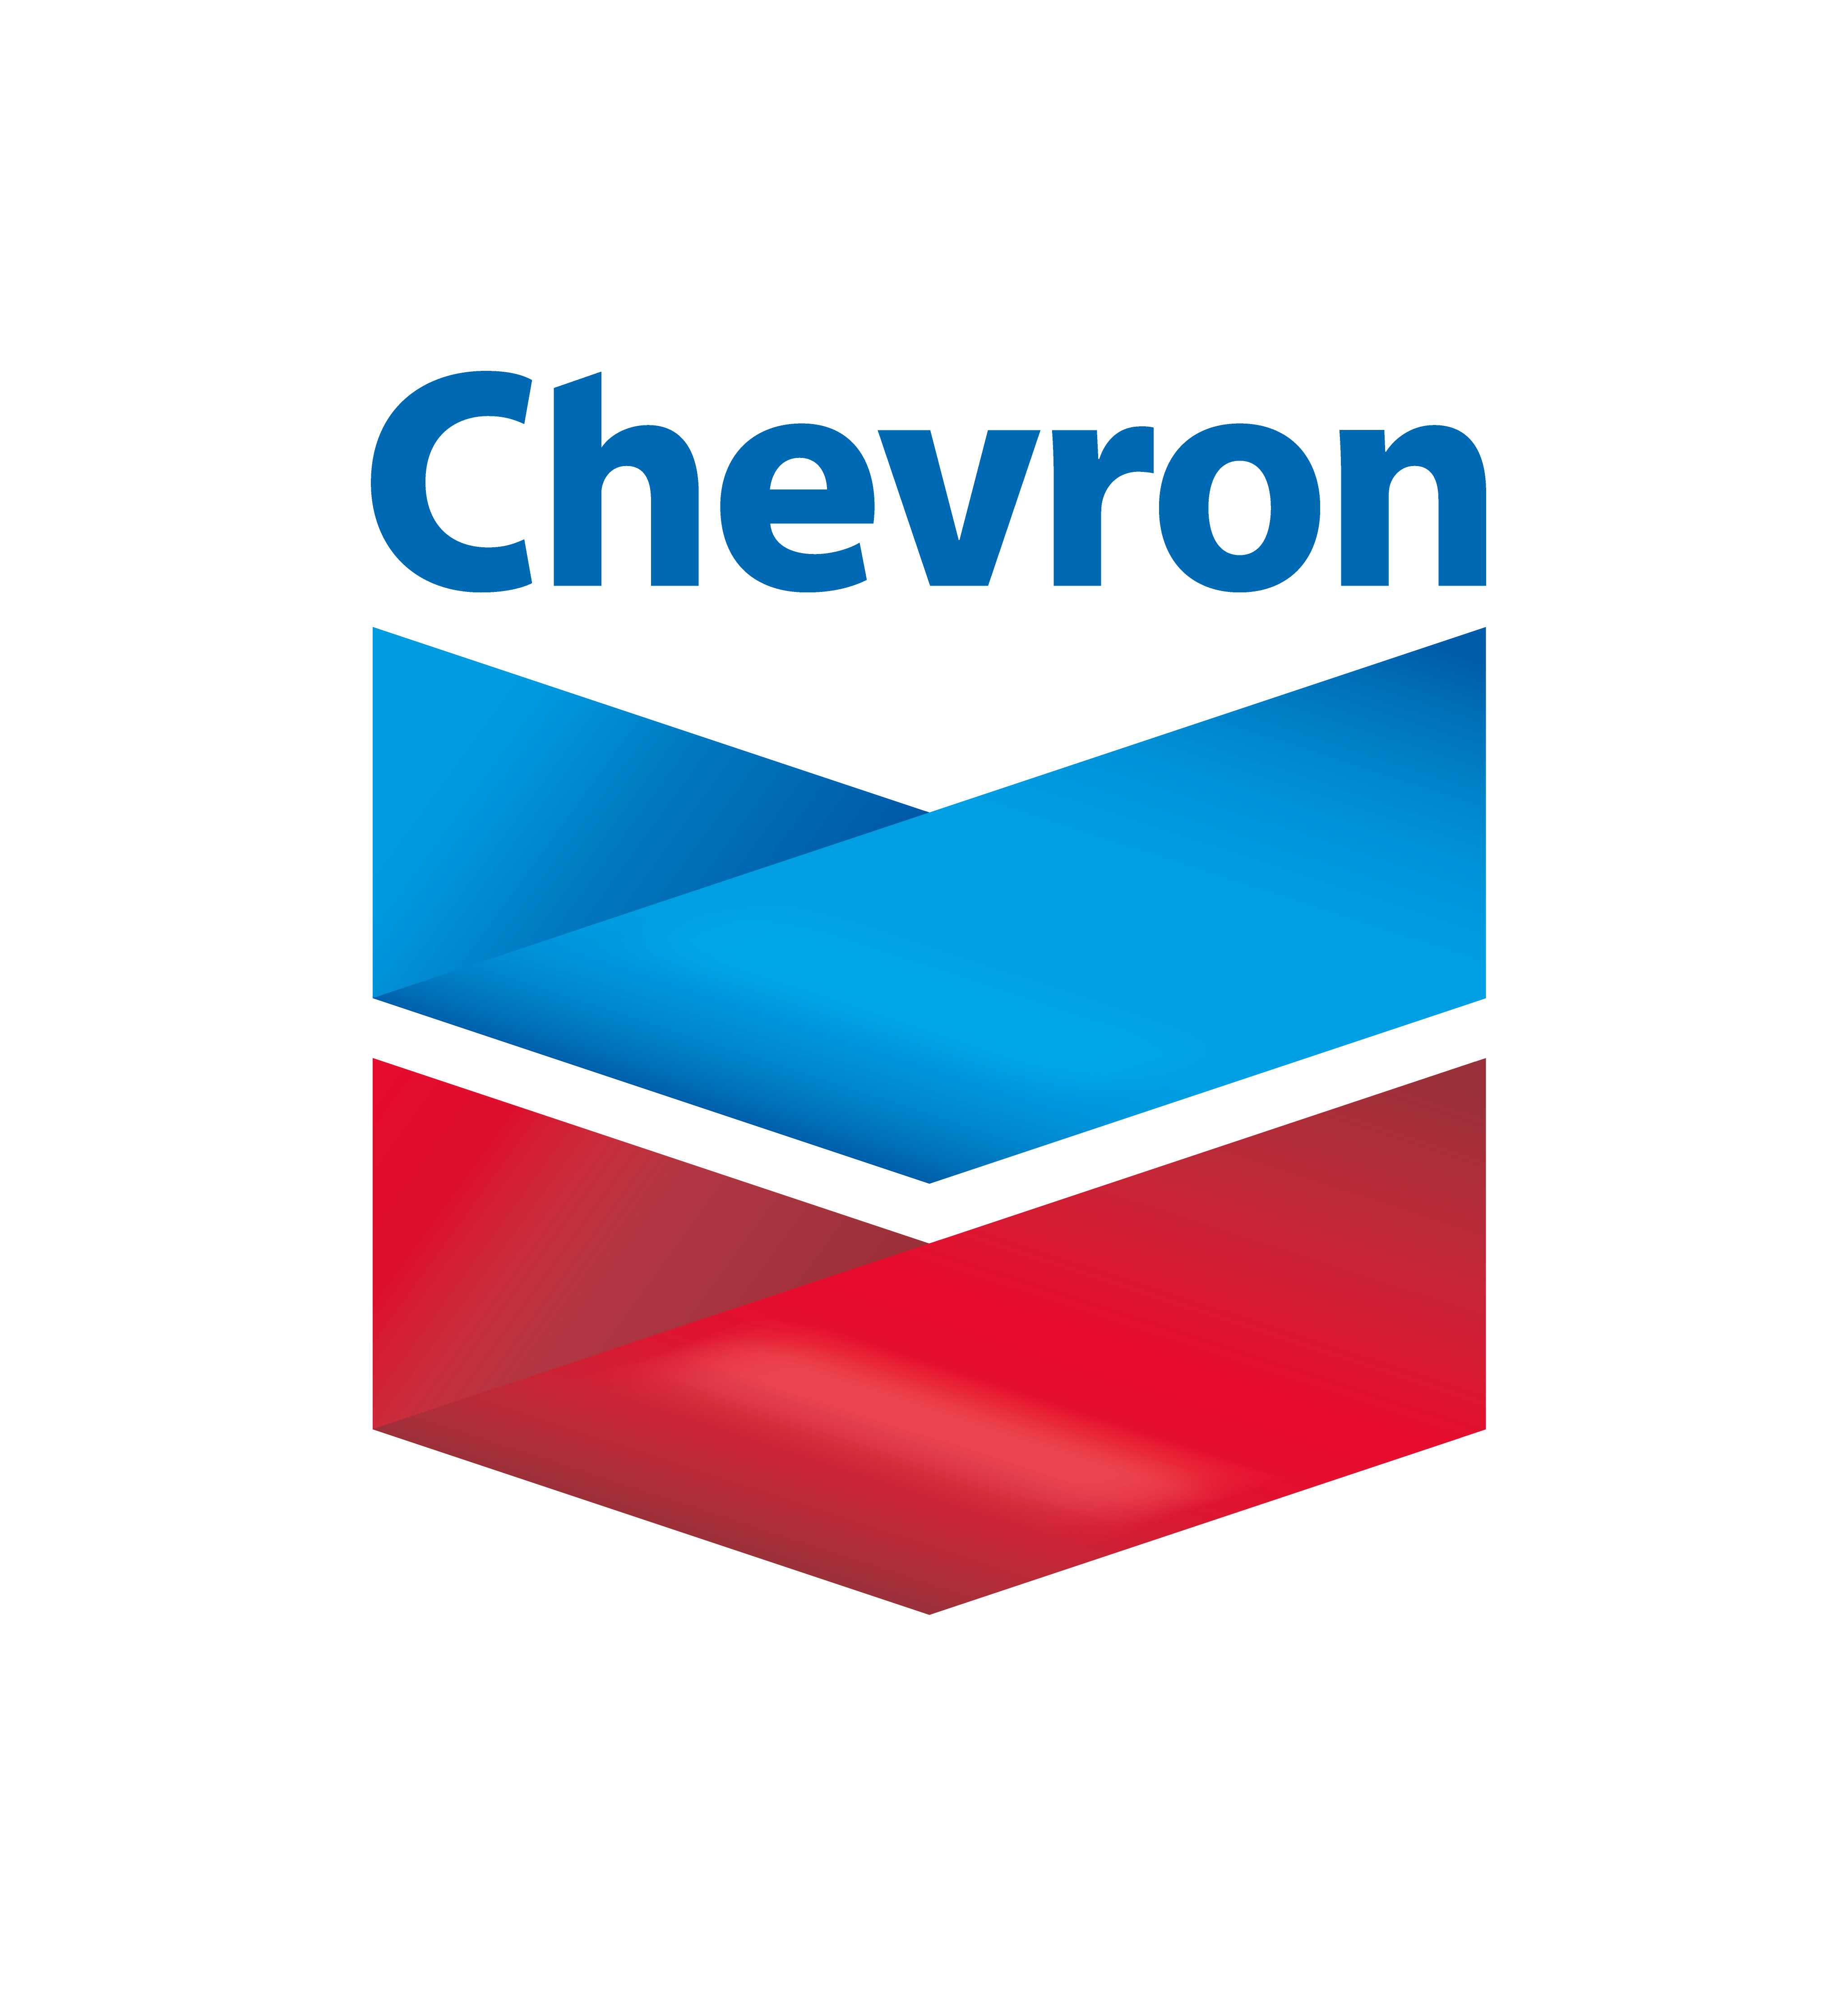 chevron logo 0 - Chevron Logo